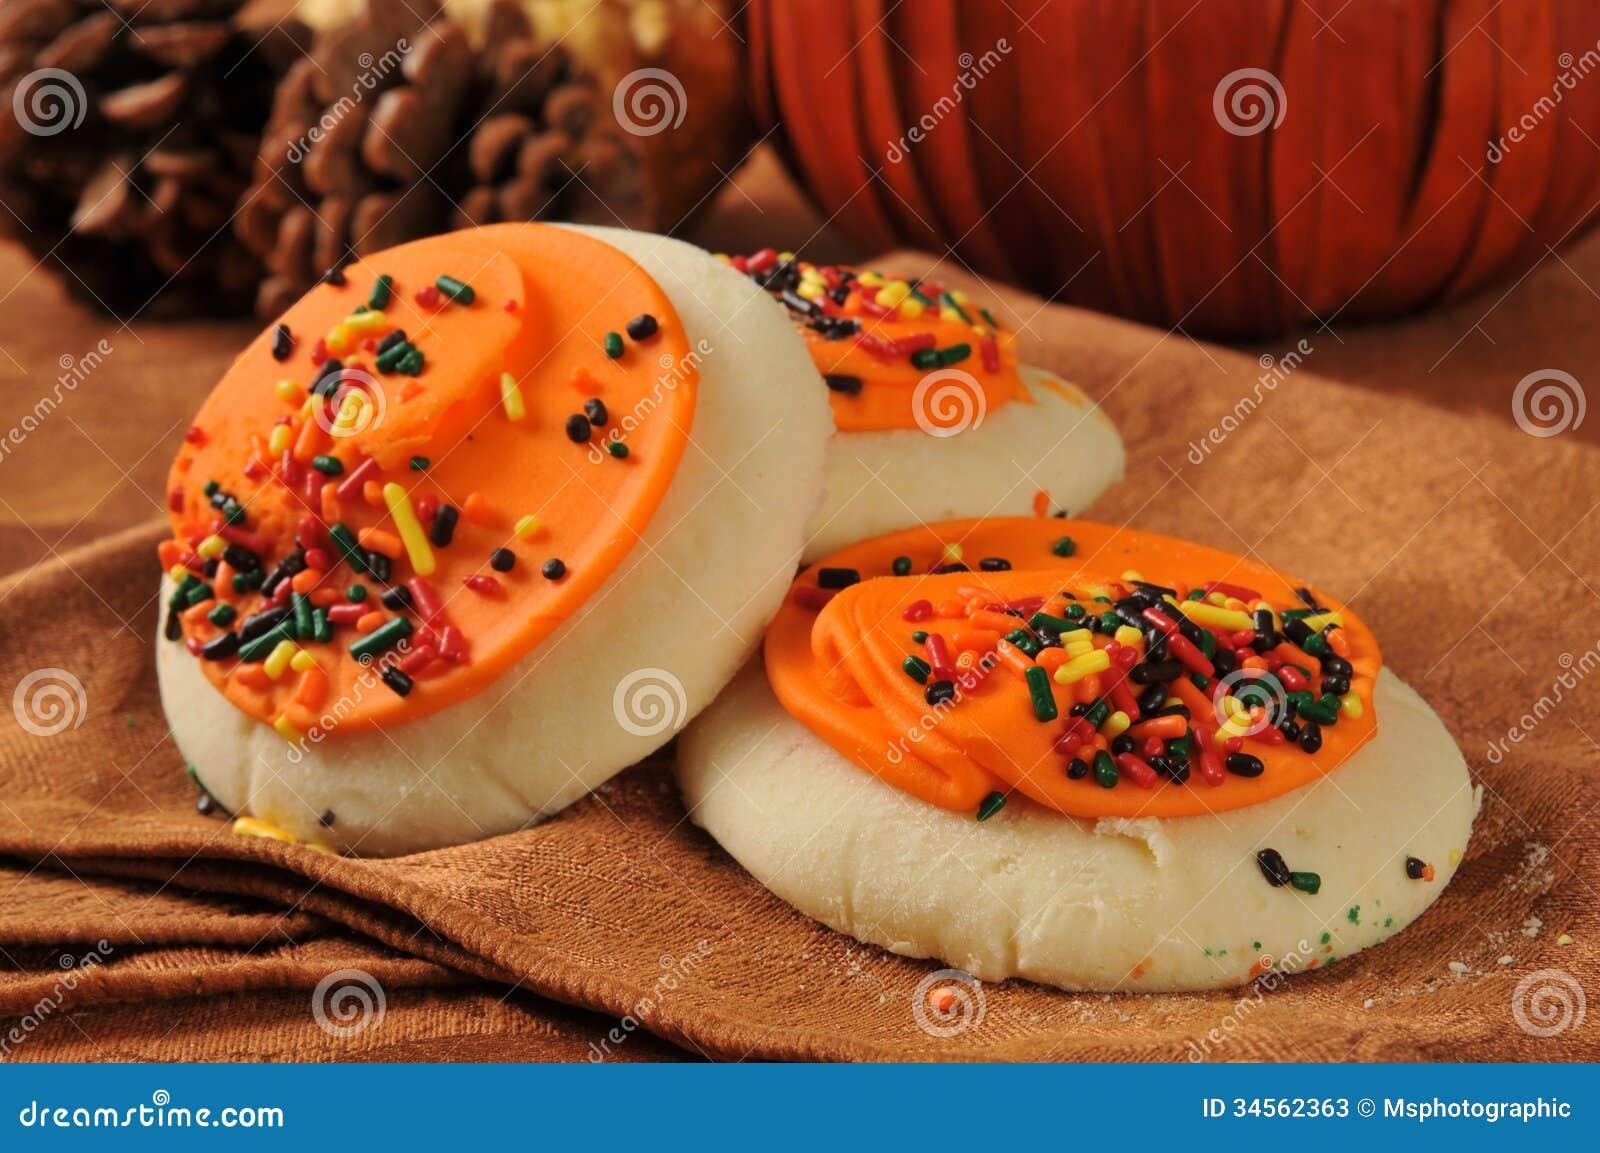 Hthanksgiving Cookie Crafts